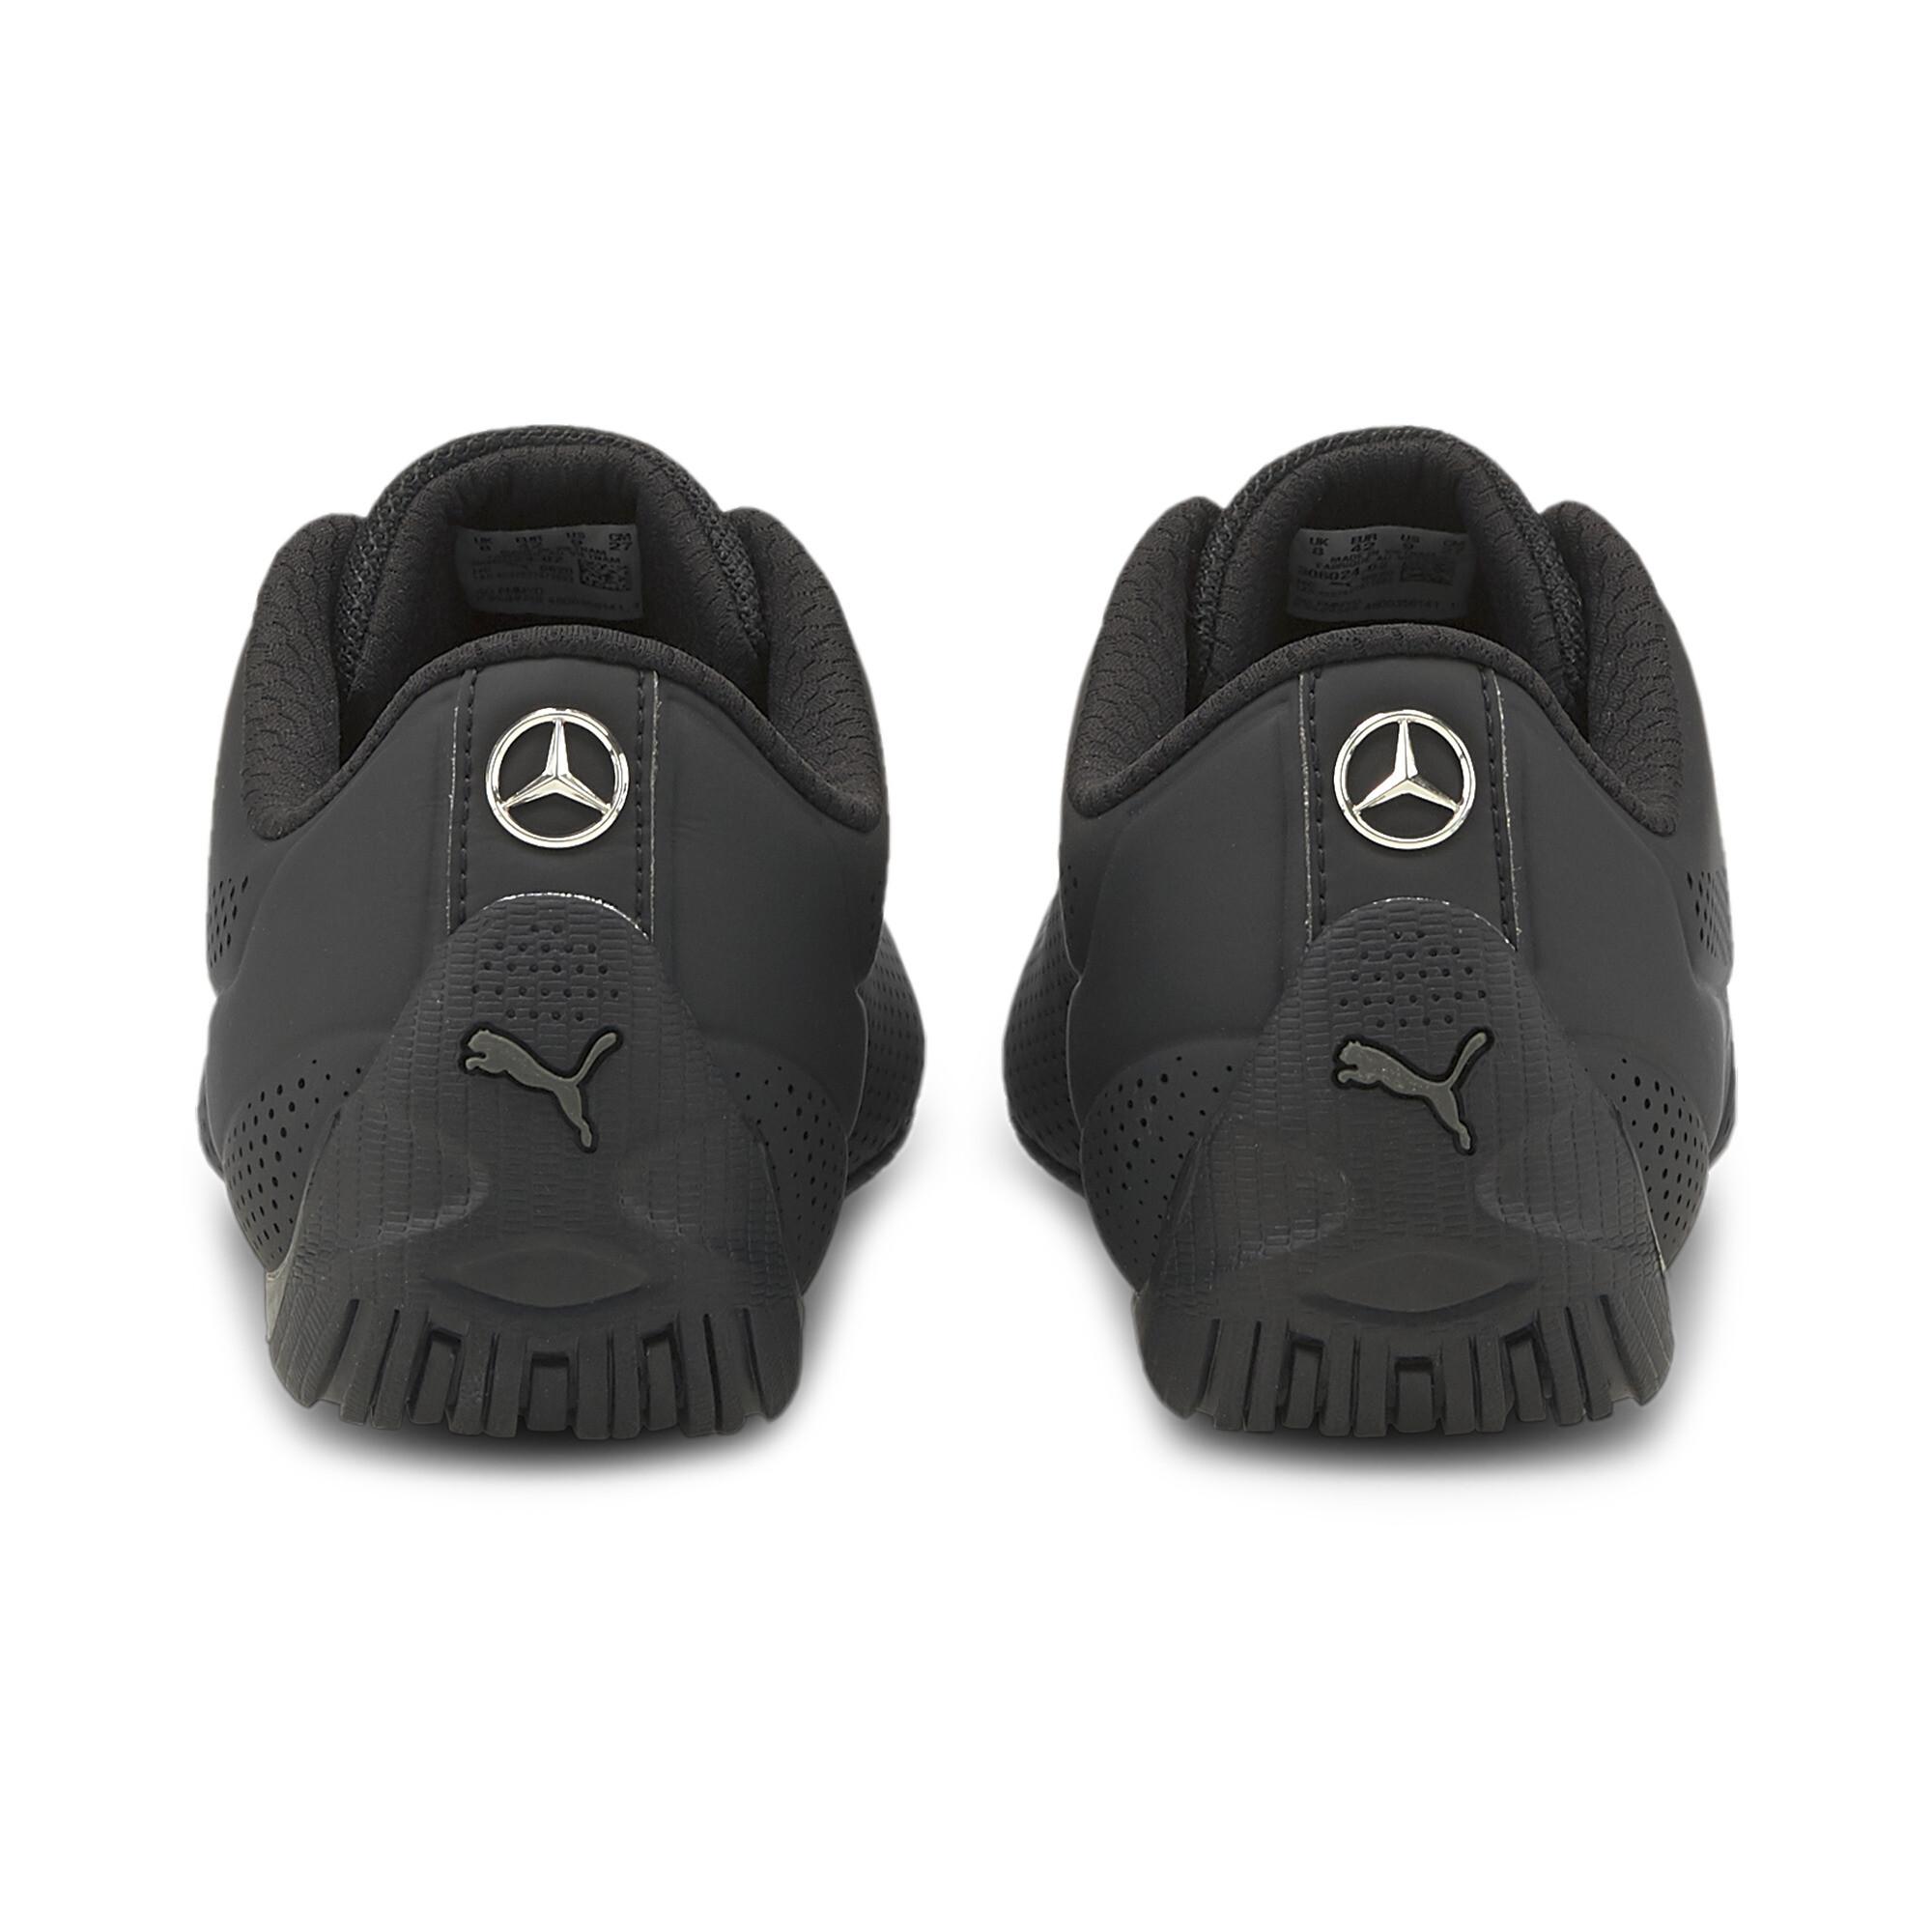 Indexbild 3 - PUMA MERCEDES AMG PETRONAS Drift Cat Ultra Sneaker Unisex Schuhe Neu